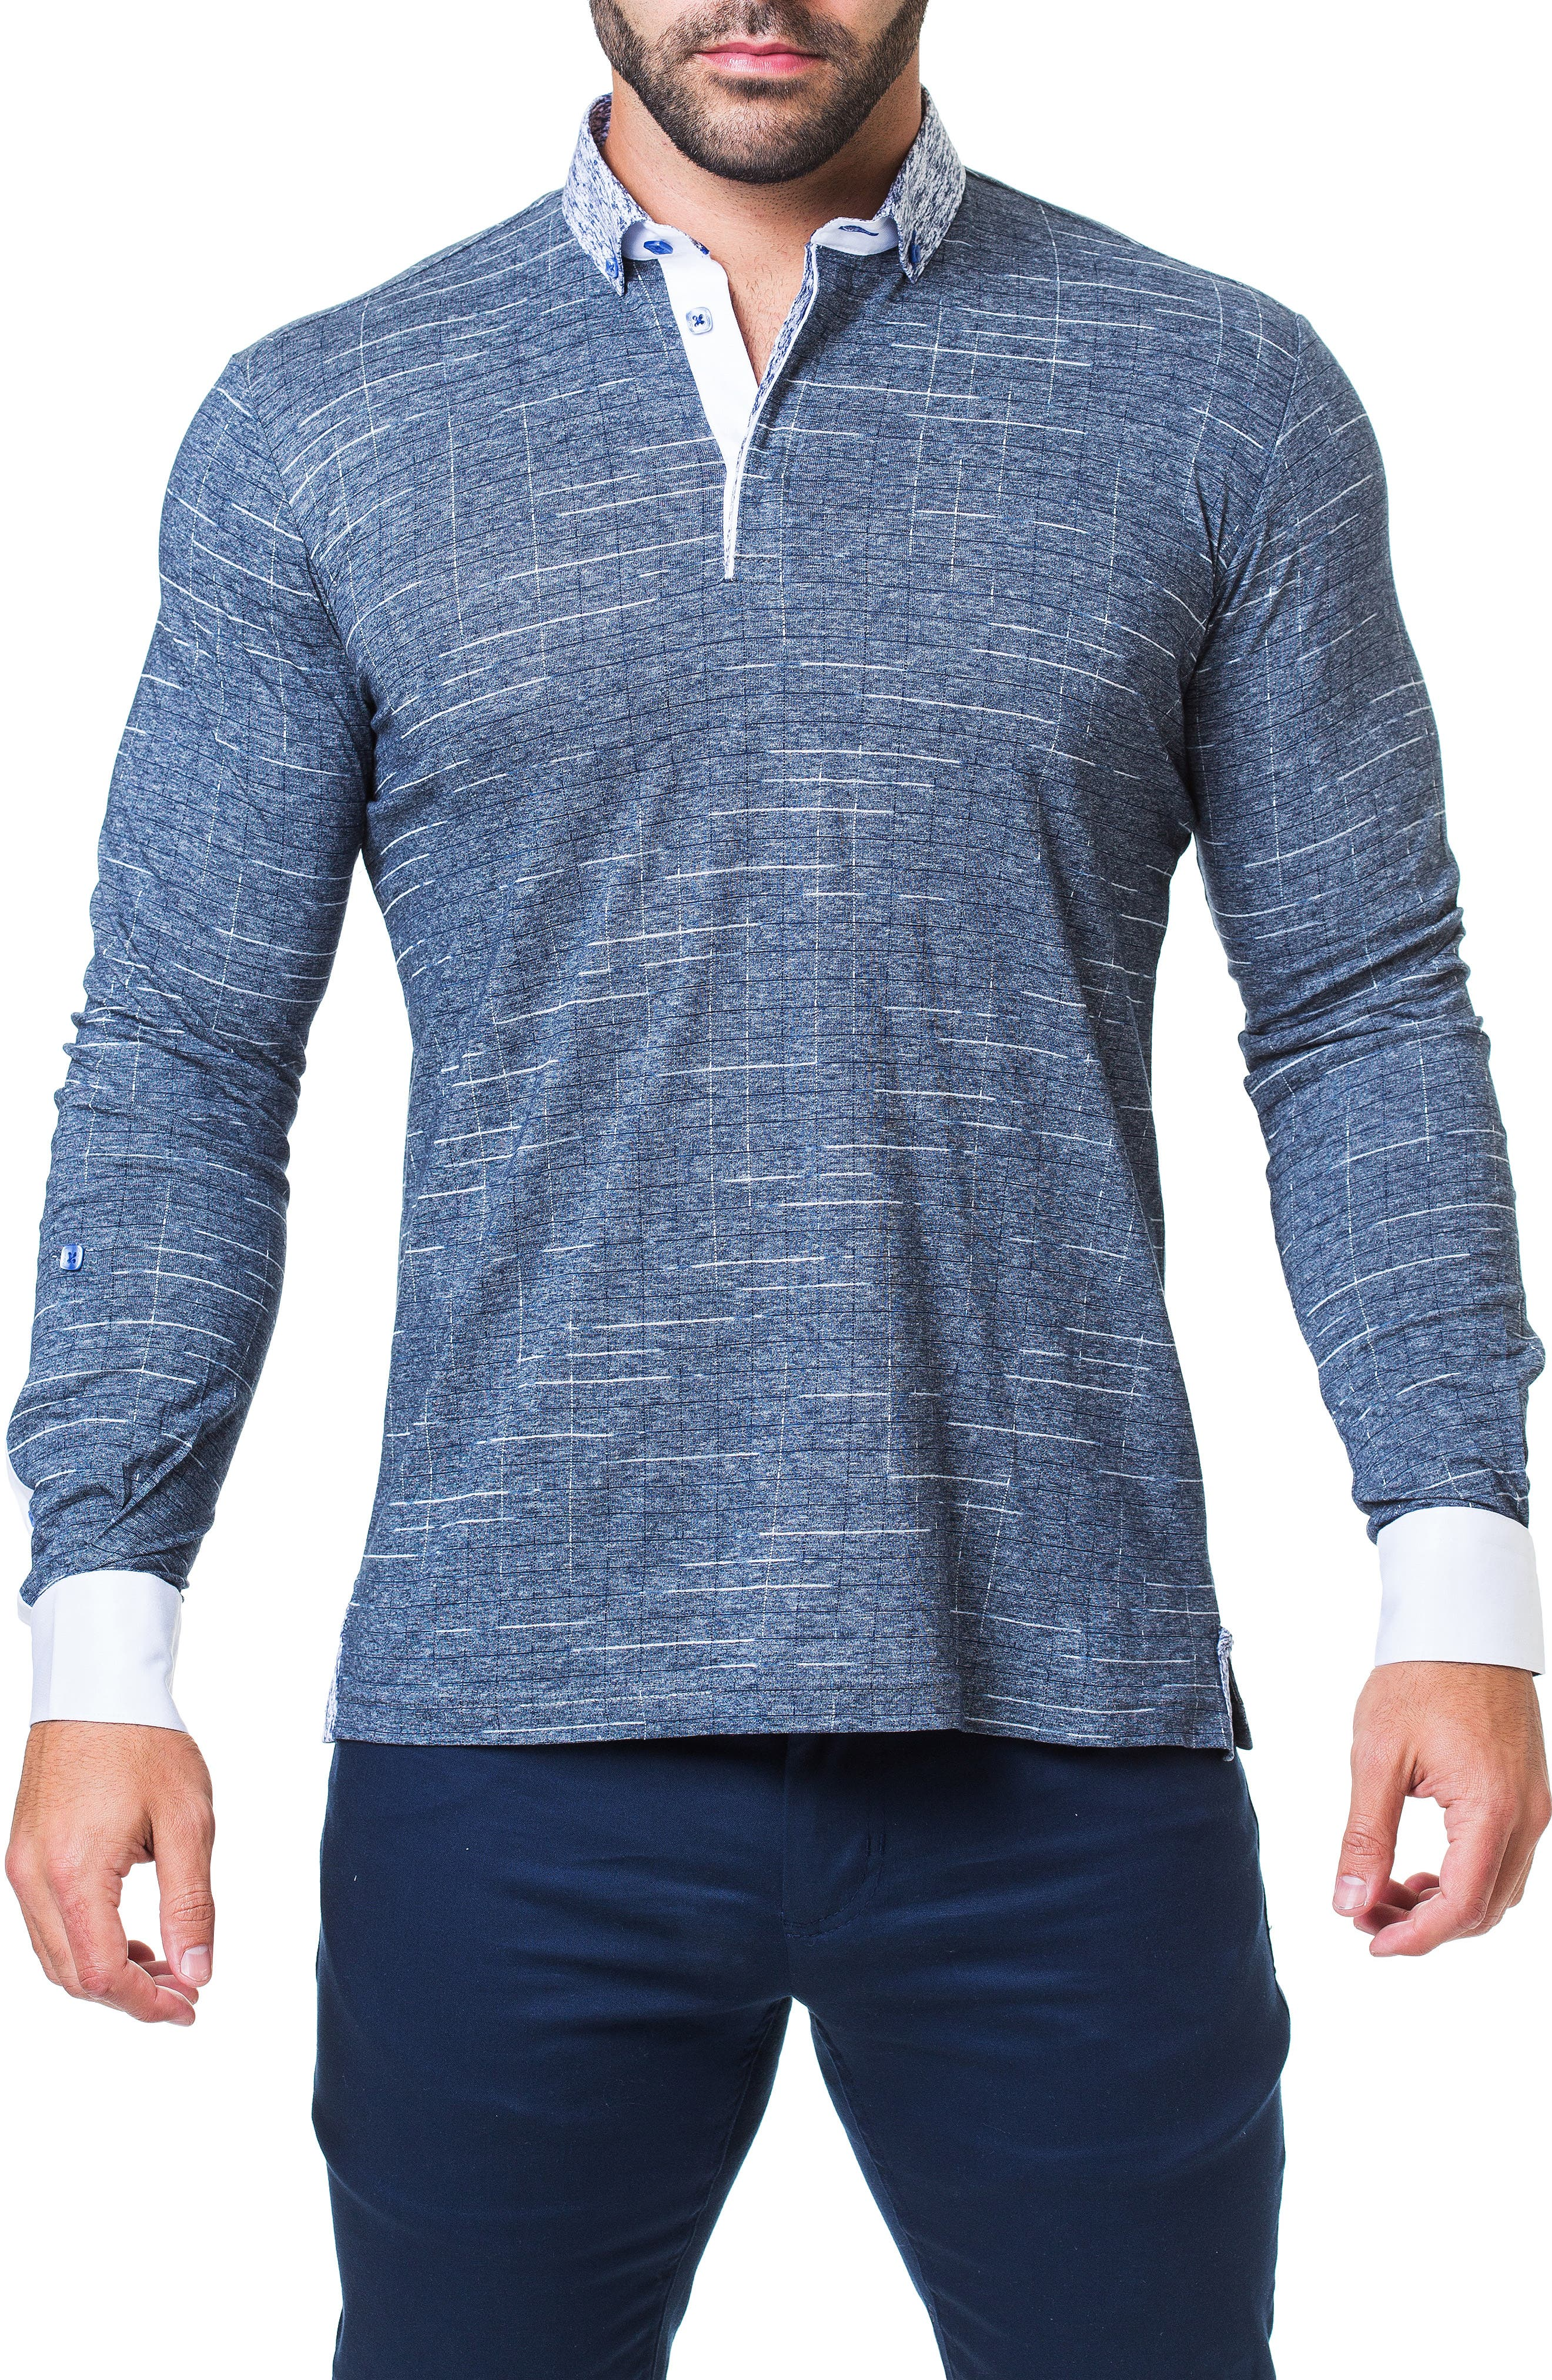 Newton Trim Fit Check Long Sleeve Polo,                             Main thumbnail 1, color,                             420